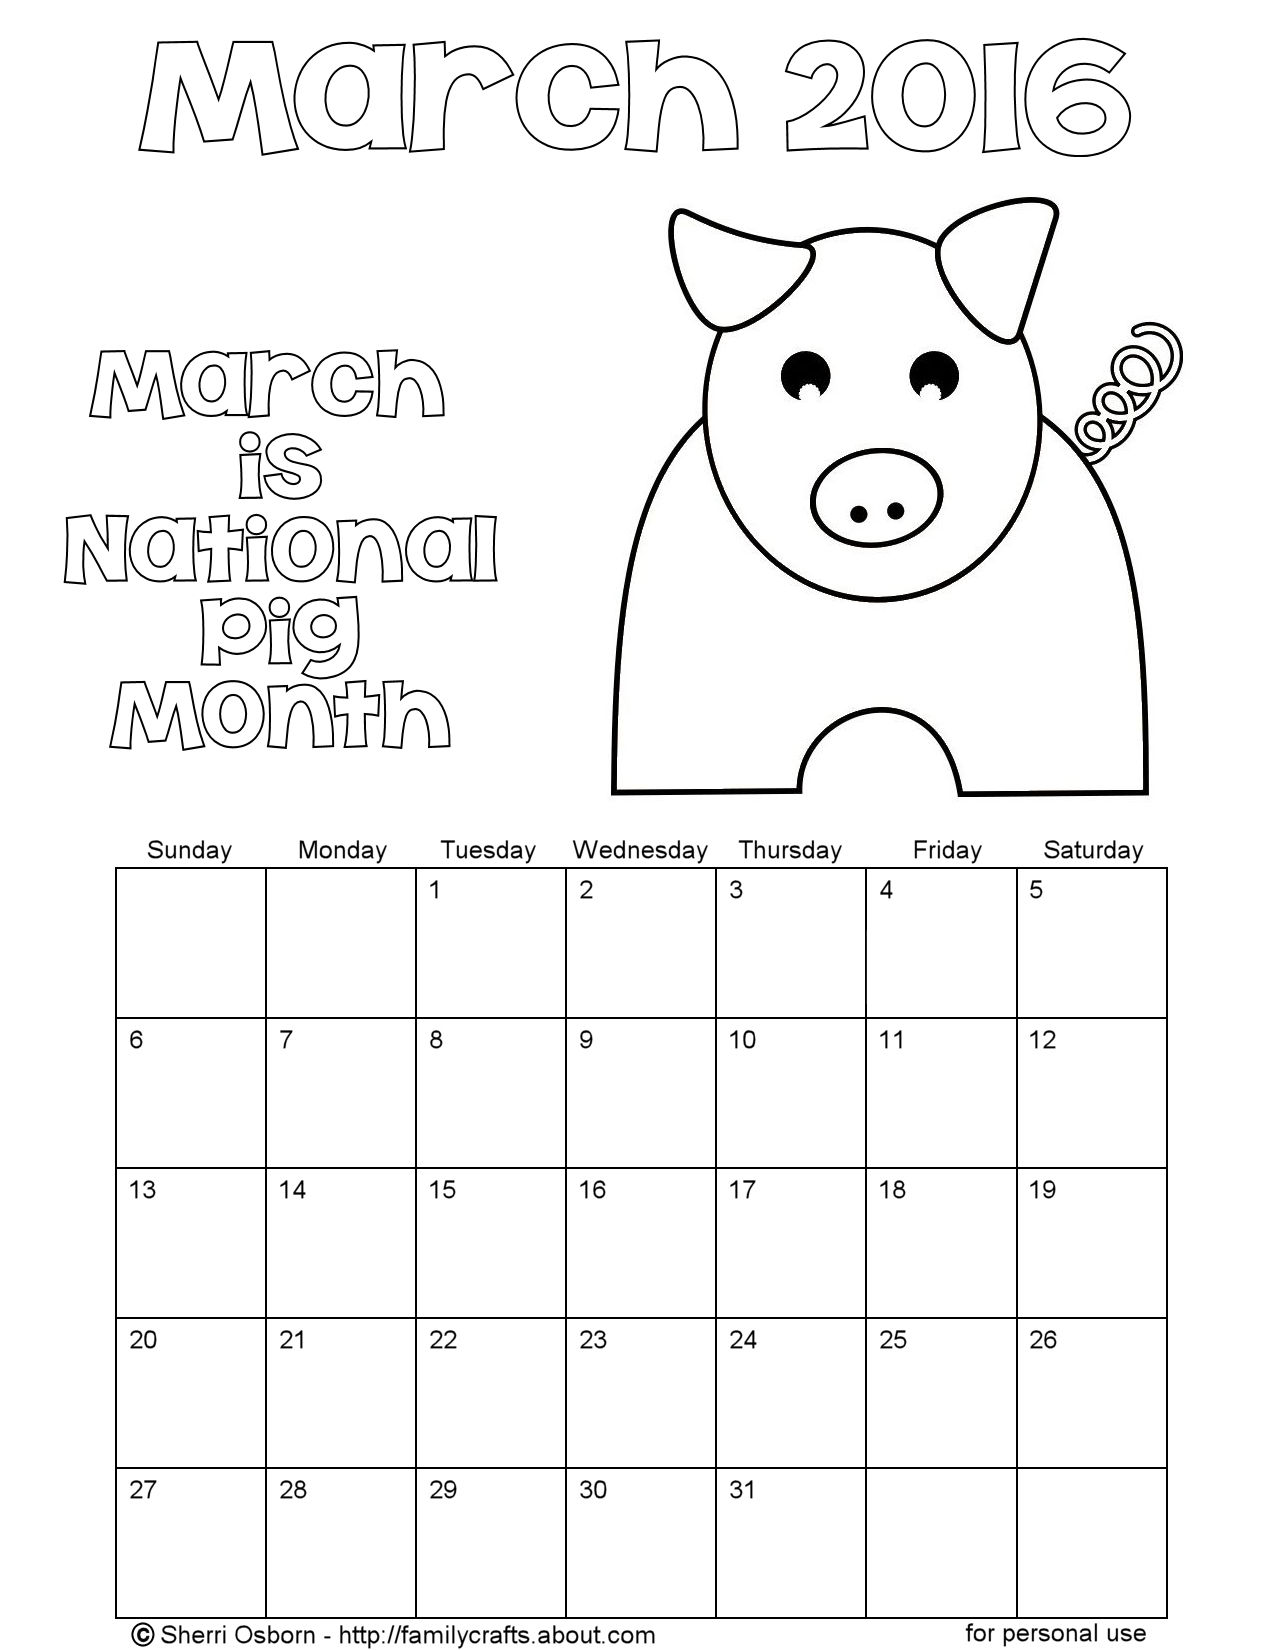 Printable March 2016 CalendarsHoliday Favorites